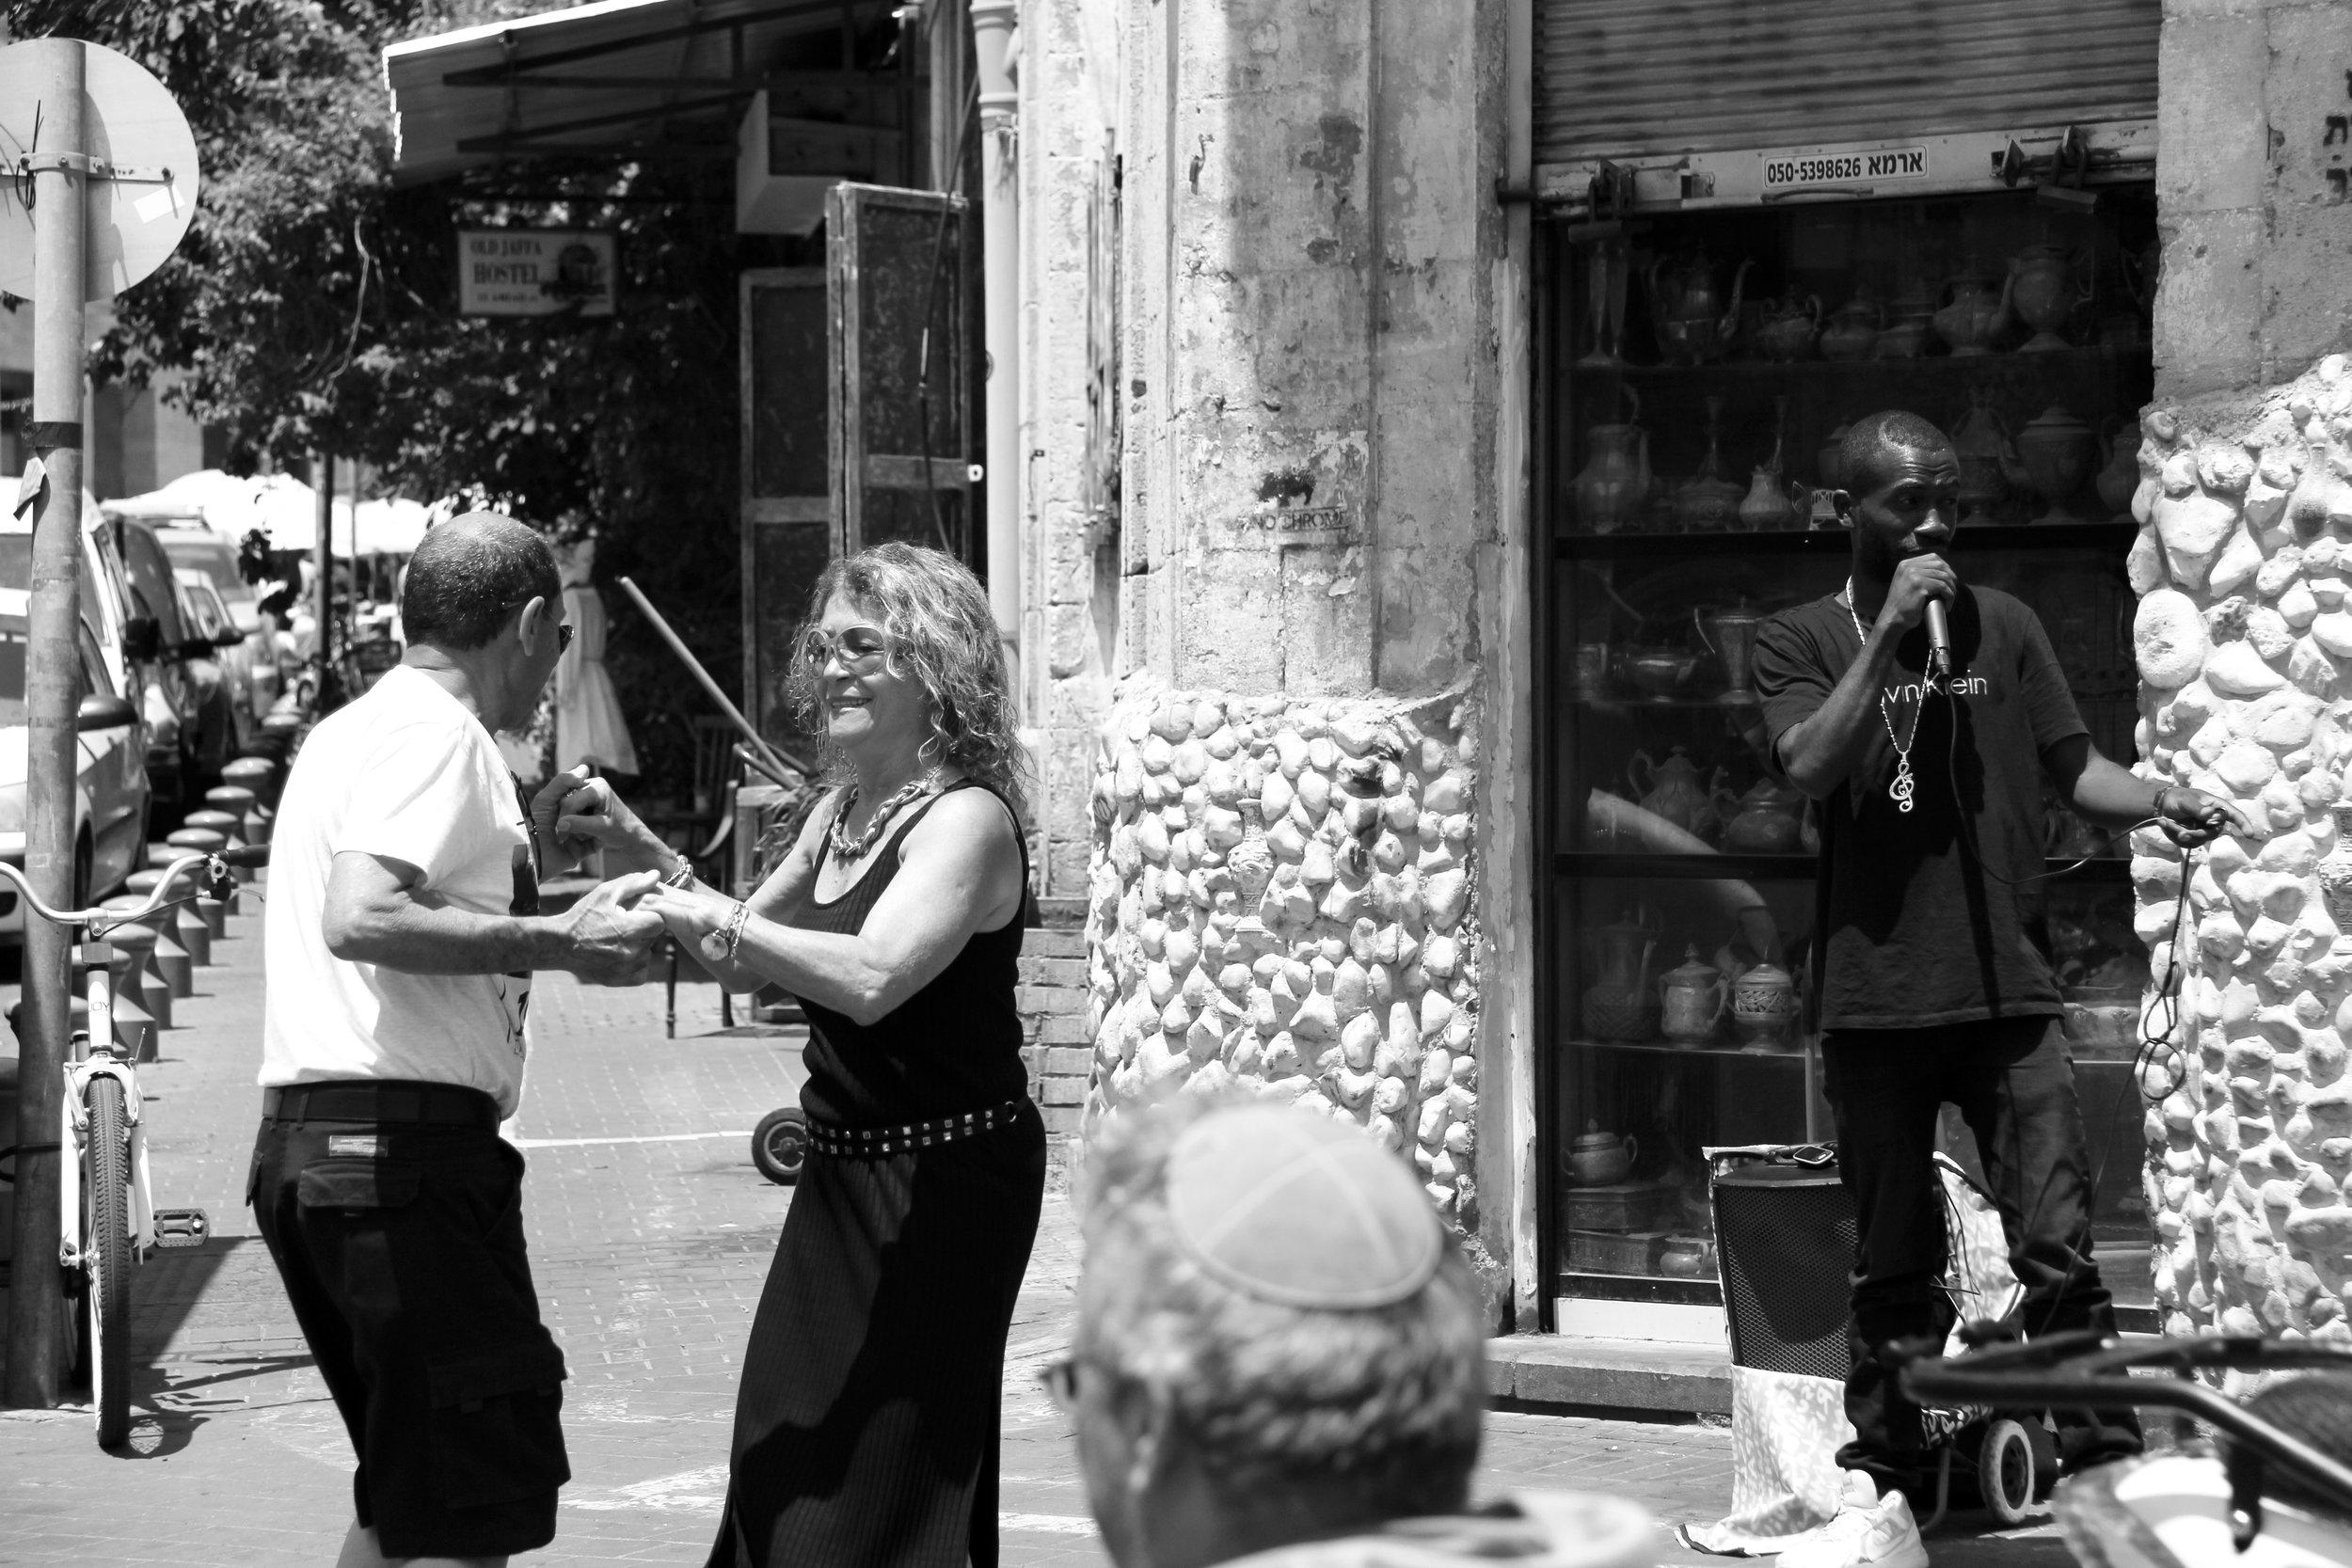 tel aviv - jaffa, israel